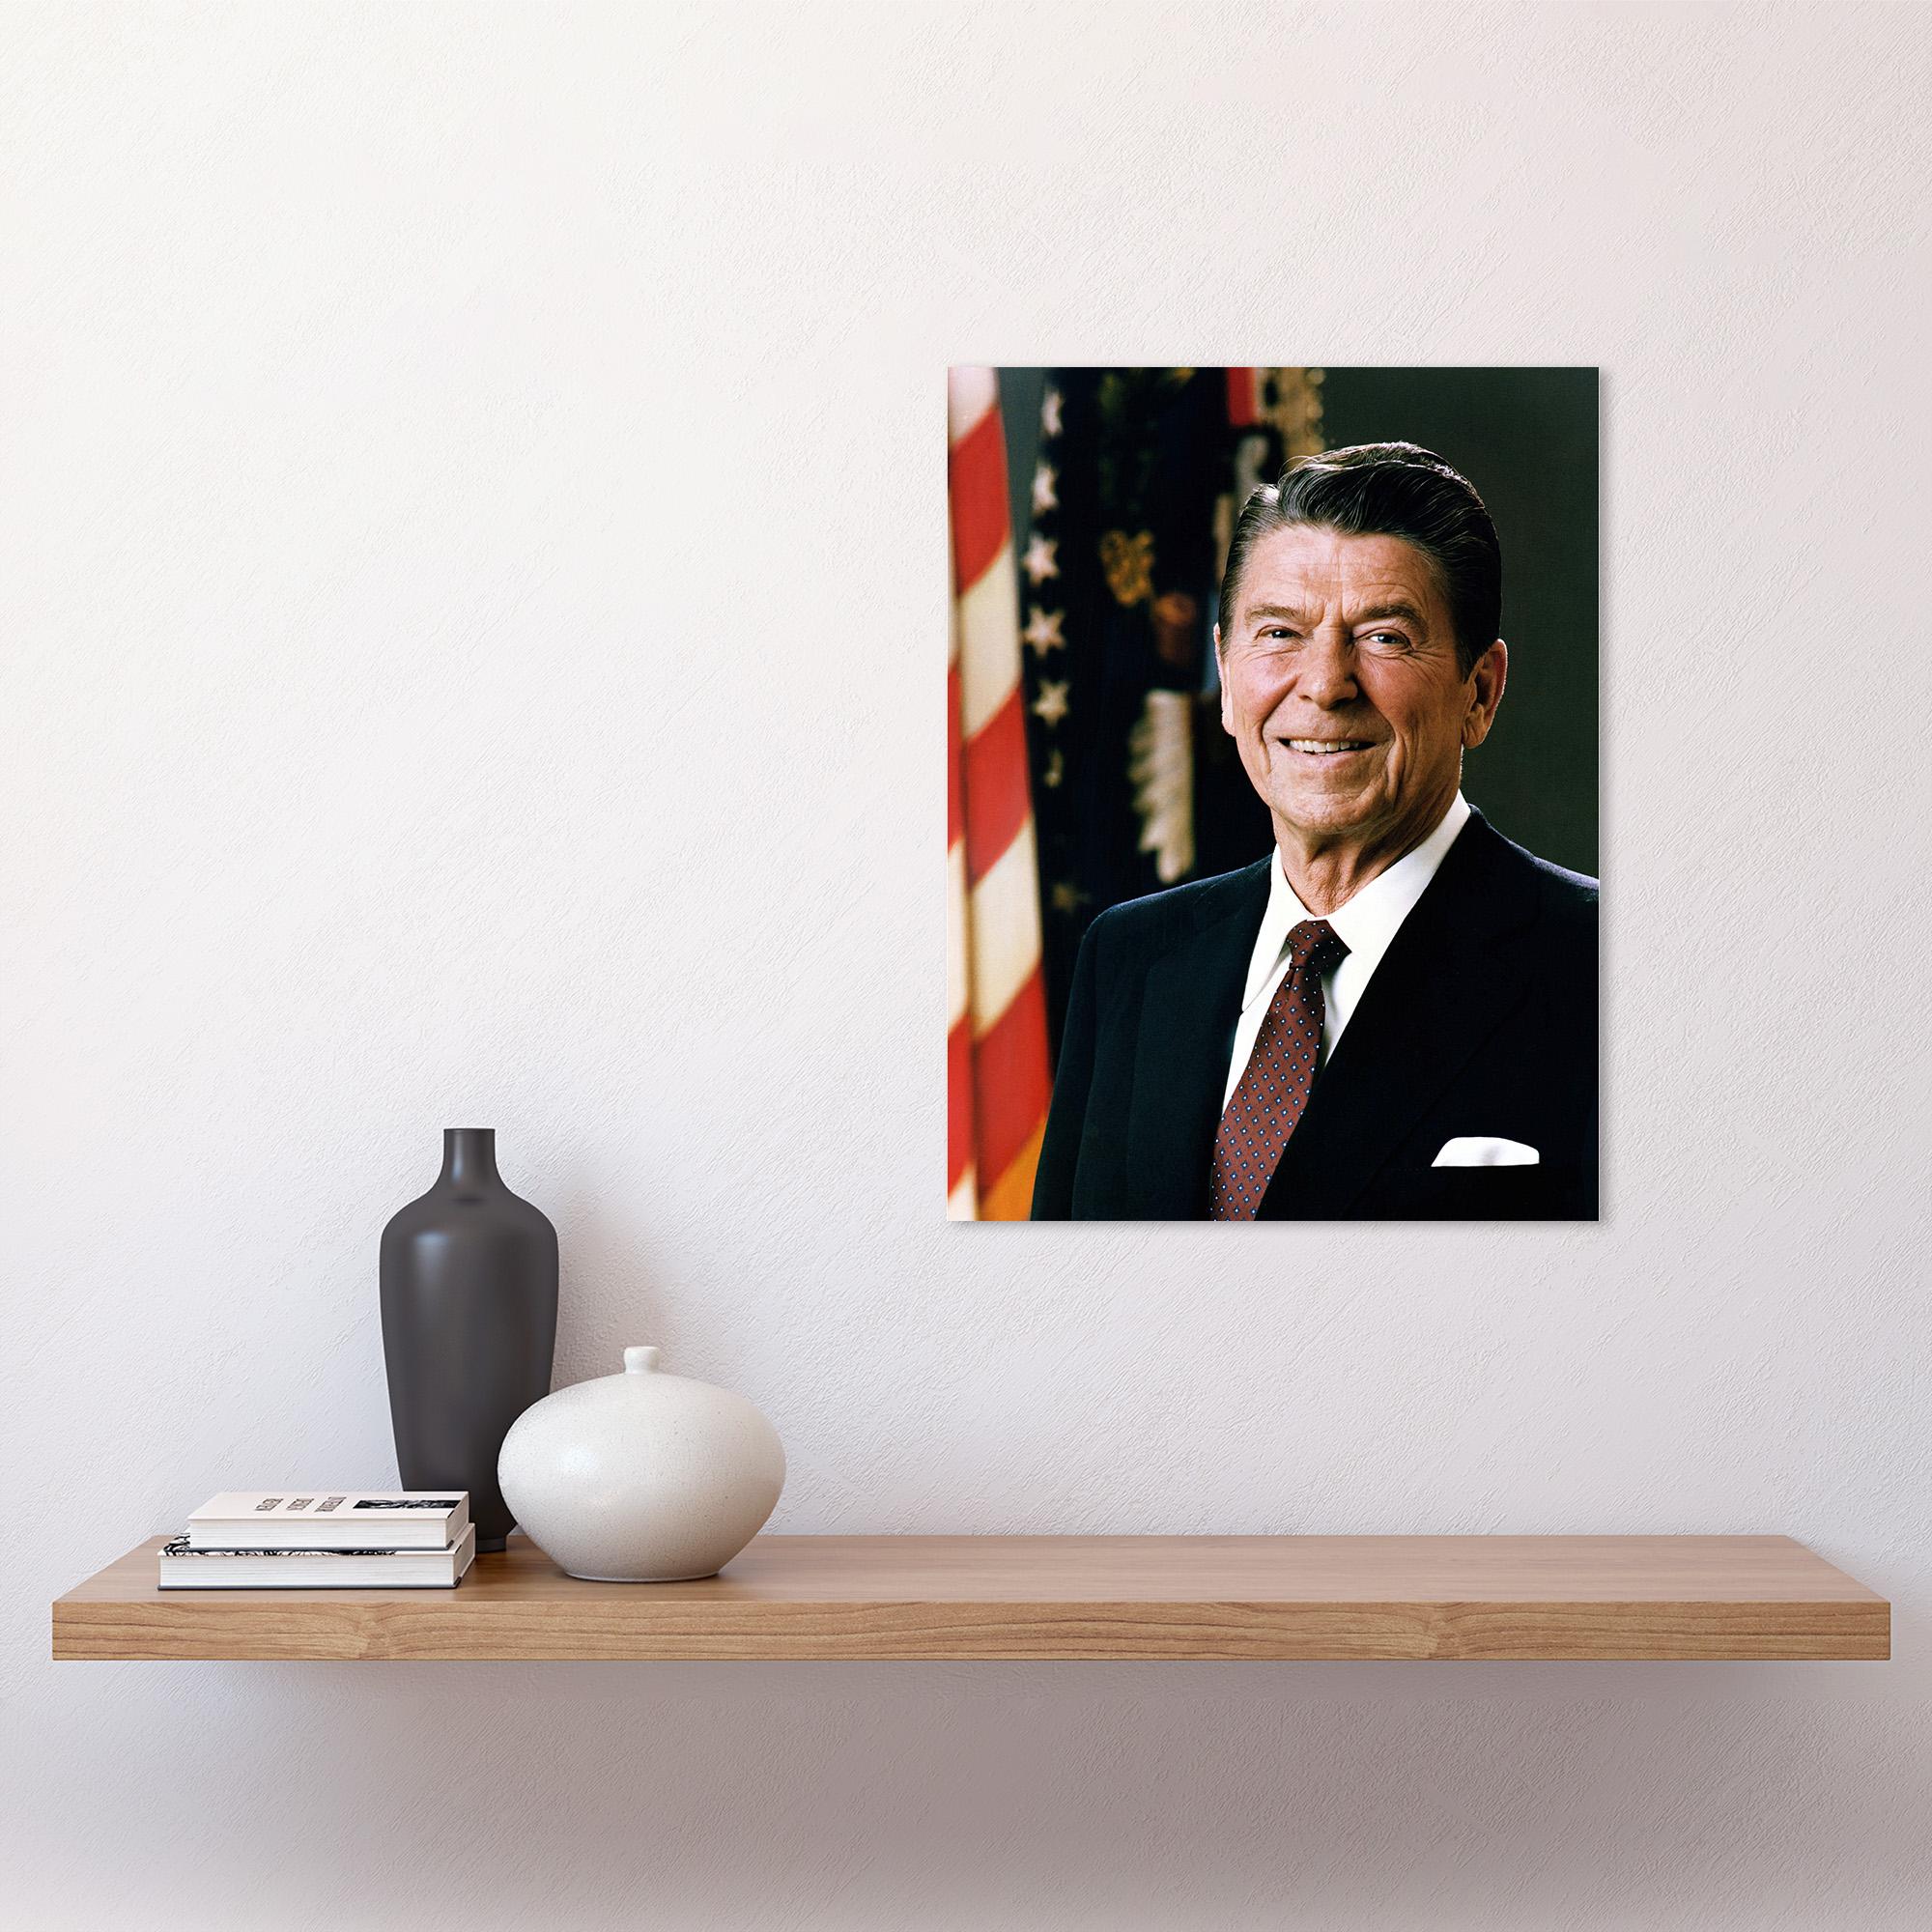 thumbnail 27 - Official-Portrait-US-President-Ronald-Reagan-Photo-Wall-Art-Print-Framed-12x16